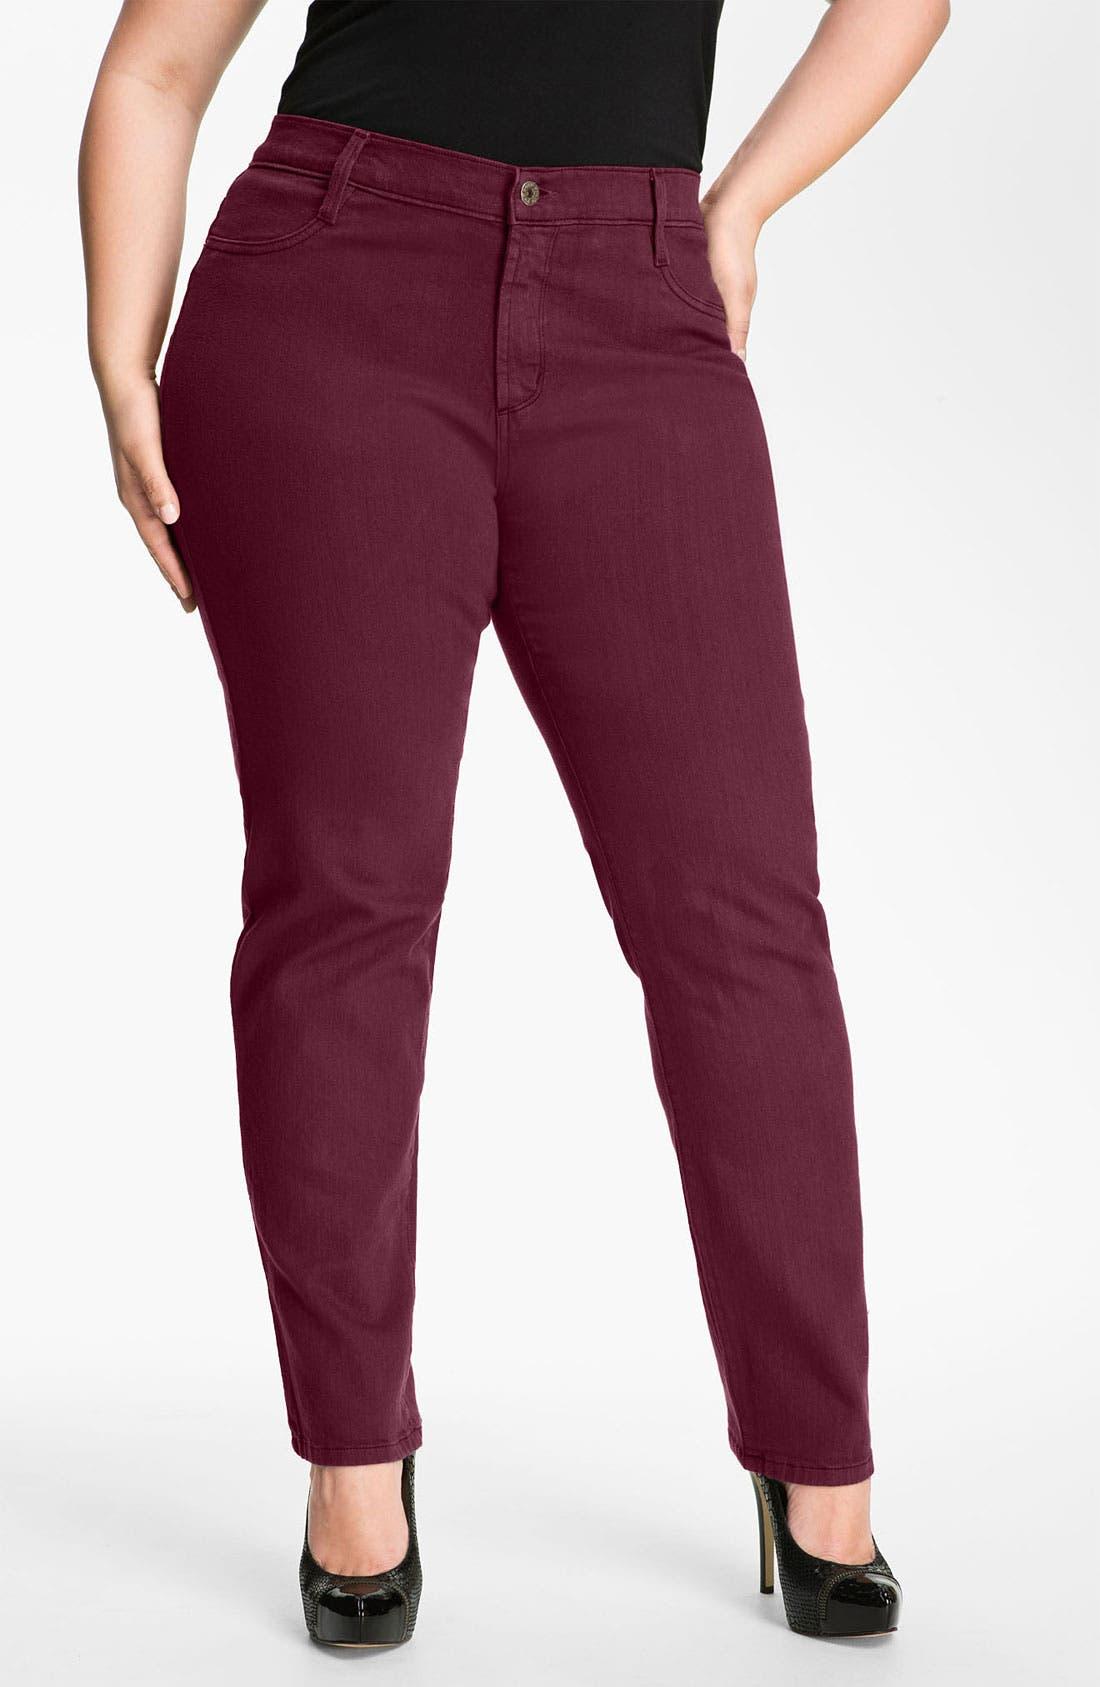 Alternate Image 1 Selected - James Jeans Stretch Denim Leggings (Plus)